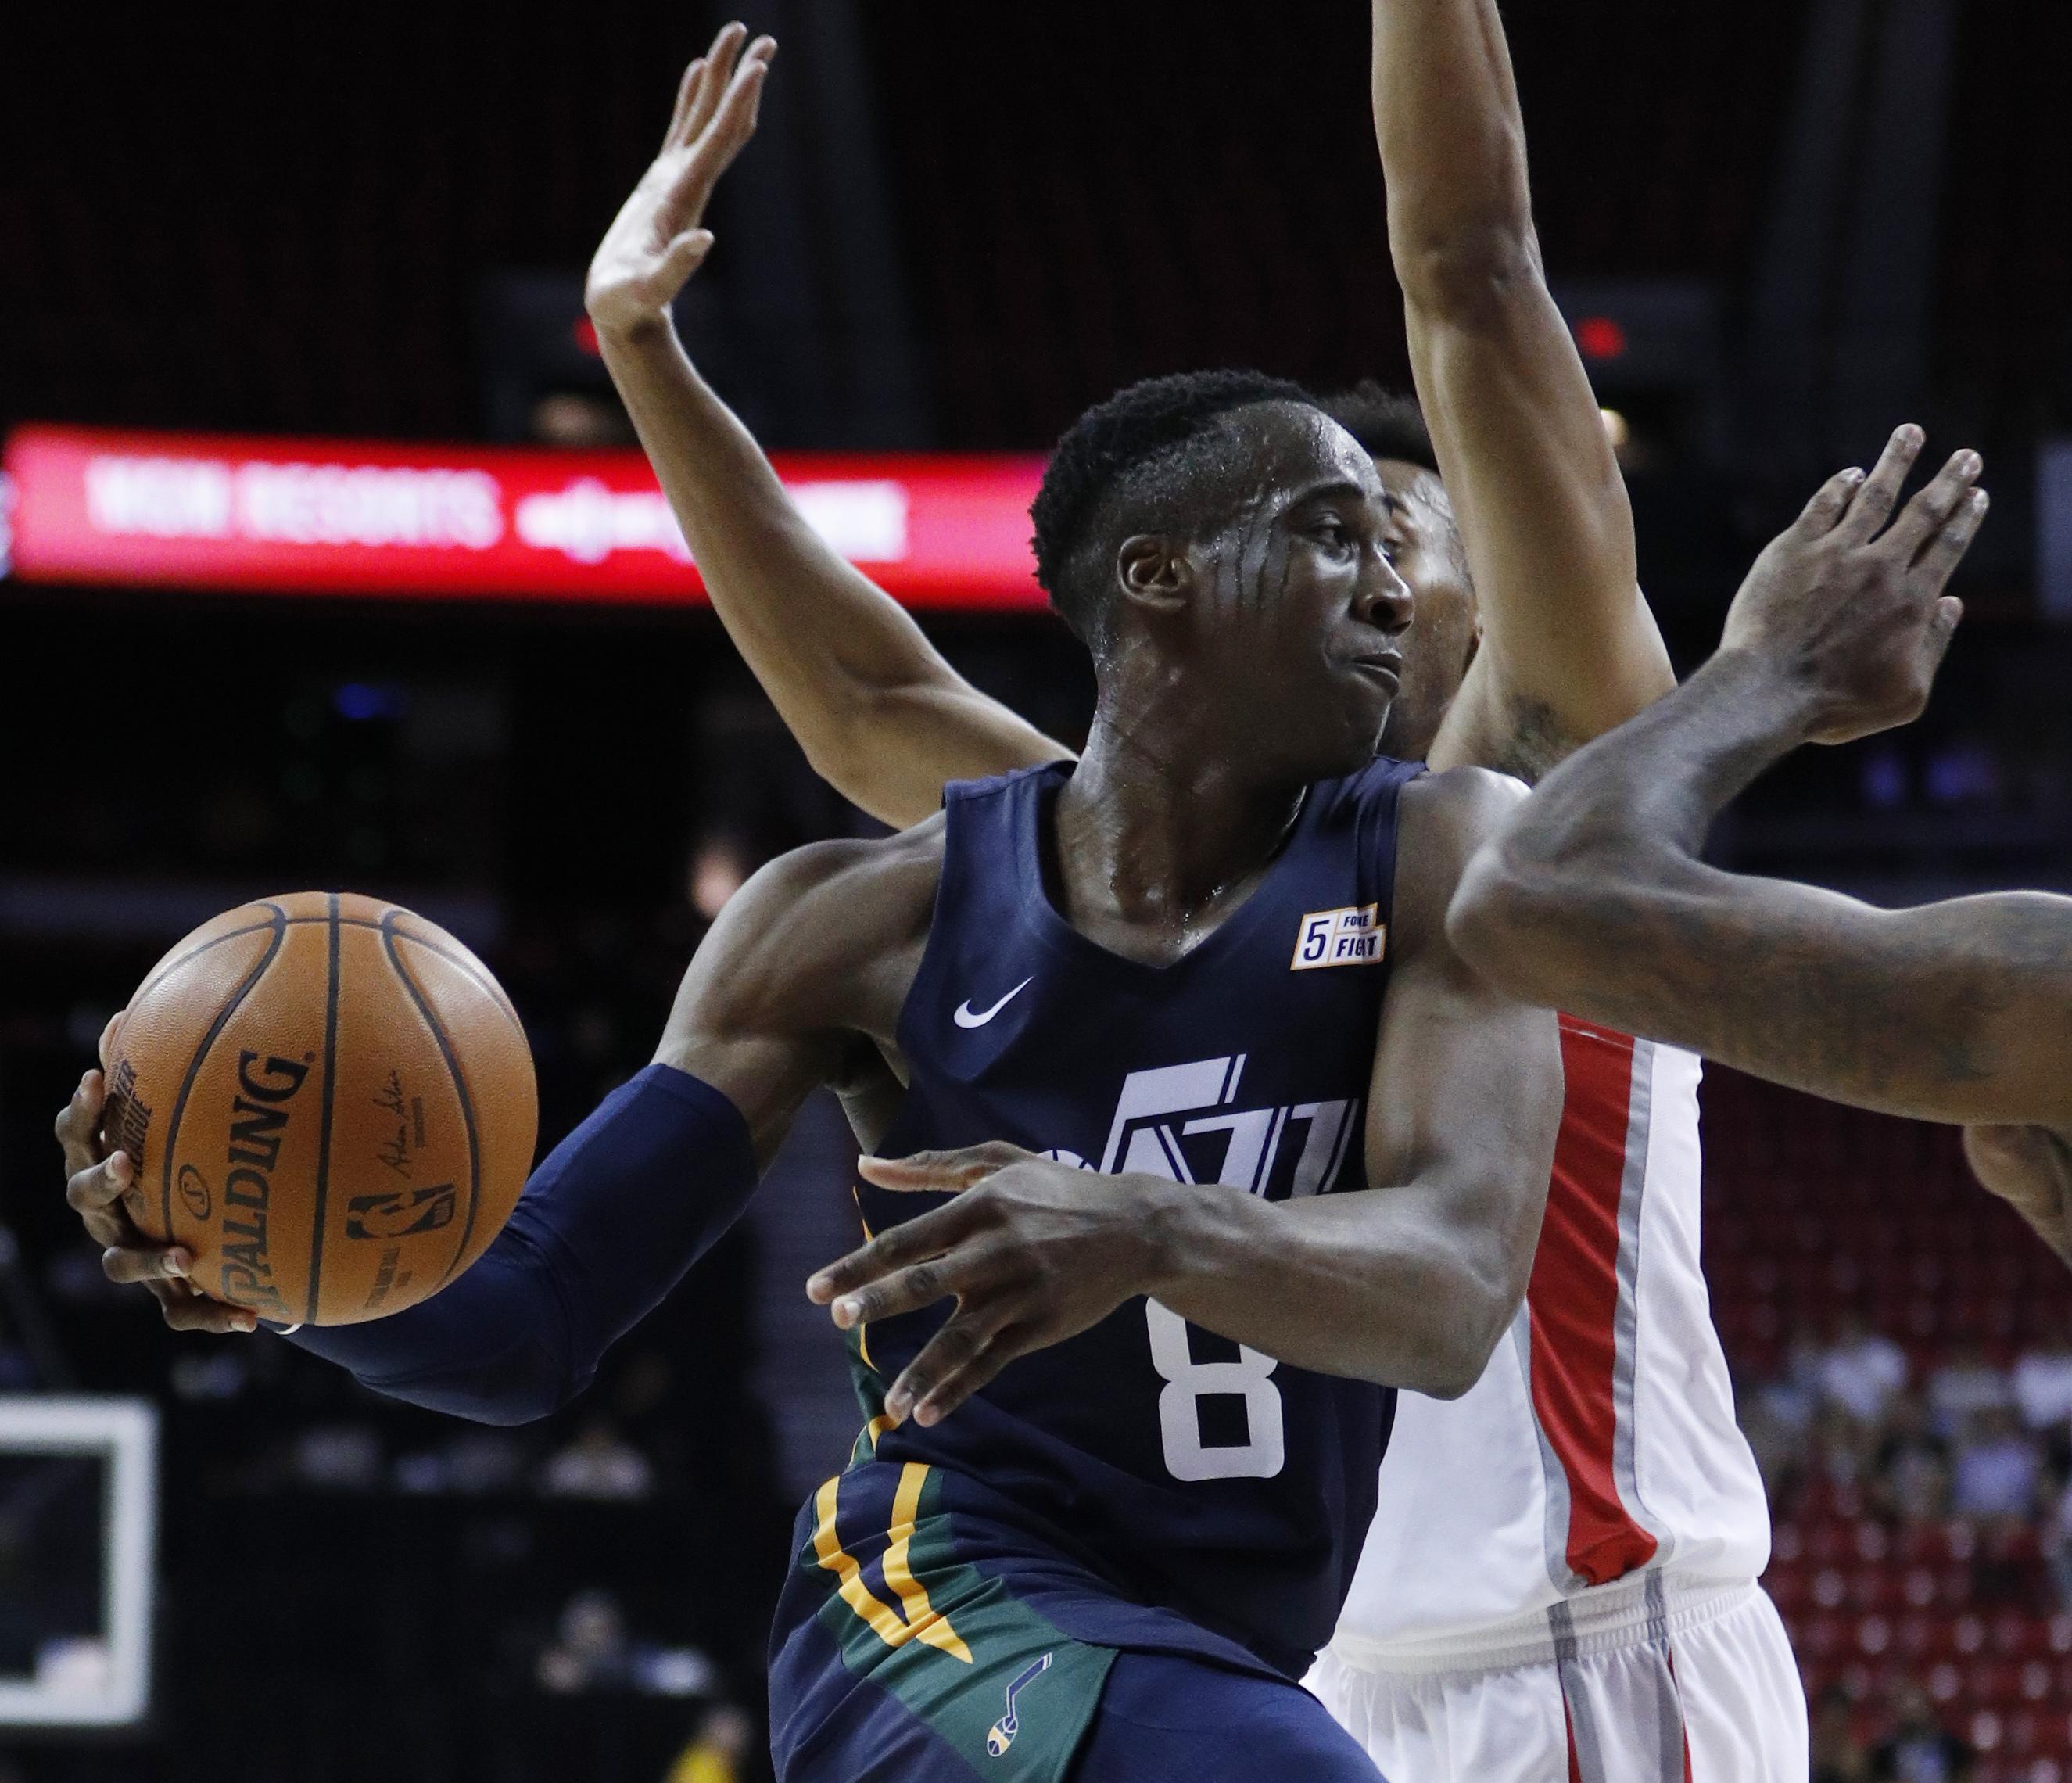 Utah Jazz's Miye Oni drive against the Houston Rockets during the second half of an NBA summer league basketball game Thursday, July 11, 2019, in Las Vegas. (AP Photo/John Locher)